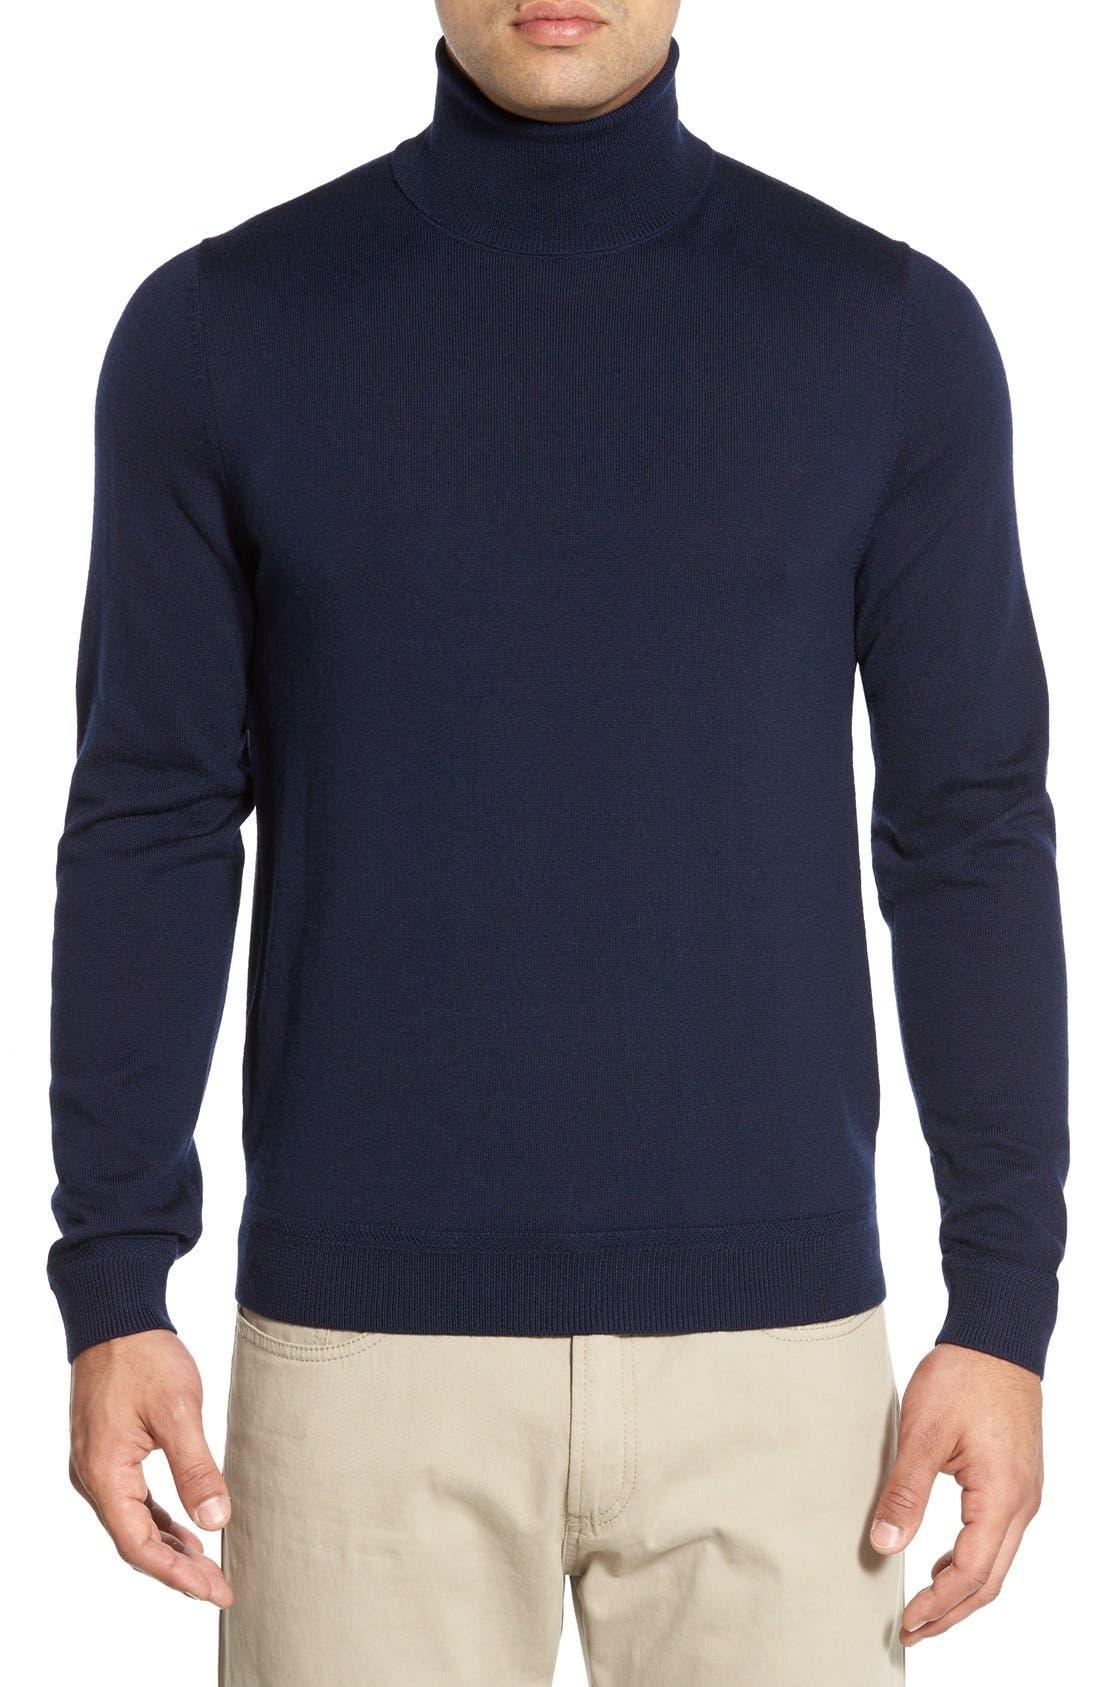 Alternate Image 1 Selected - John W. Nordstrom® Wool Turtleneck Sweater